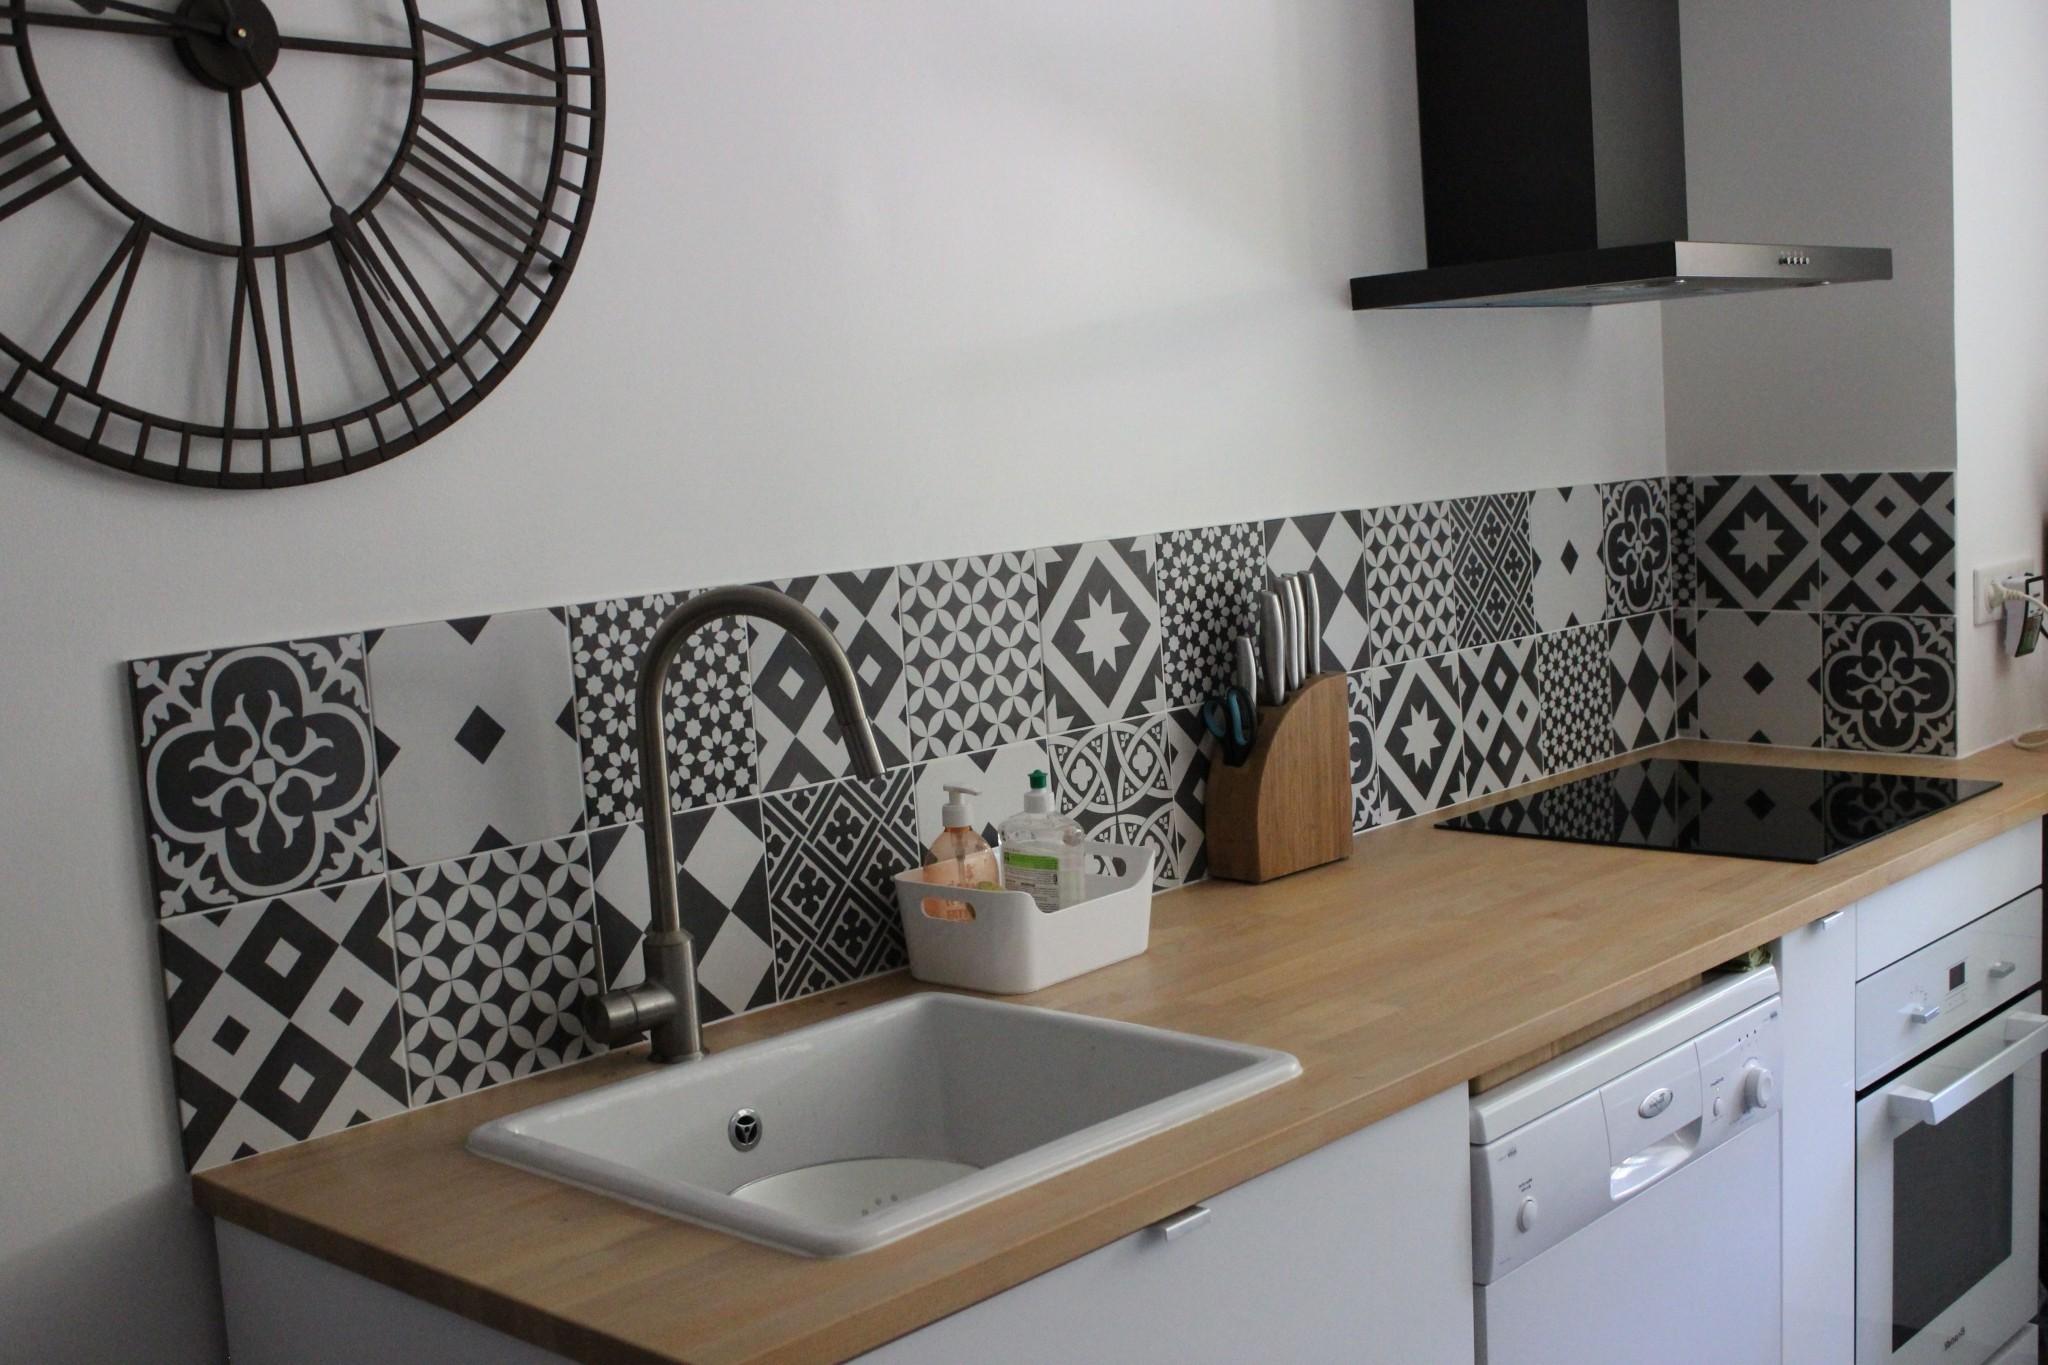 carrelage cuisine le roy merlin cuisine id es de. Black Bedroom Furniture Sets. Home Design Ideas